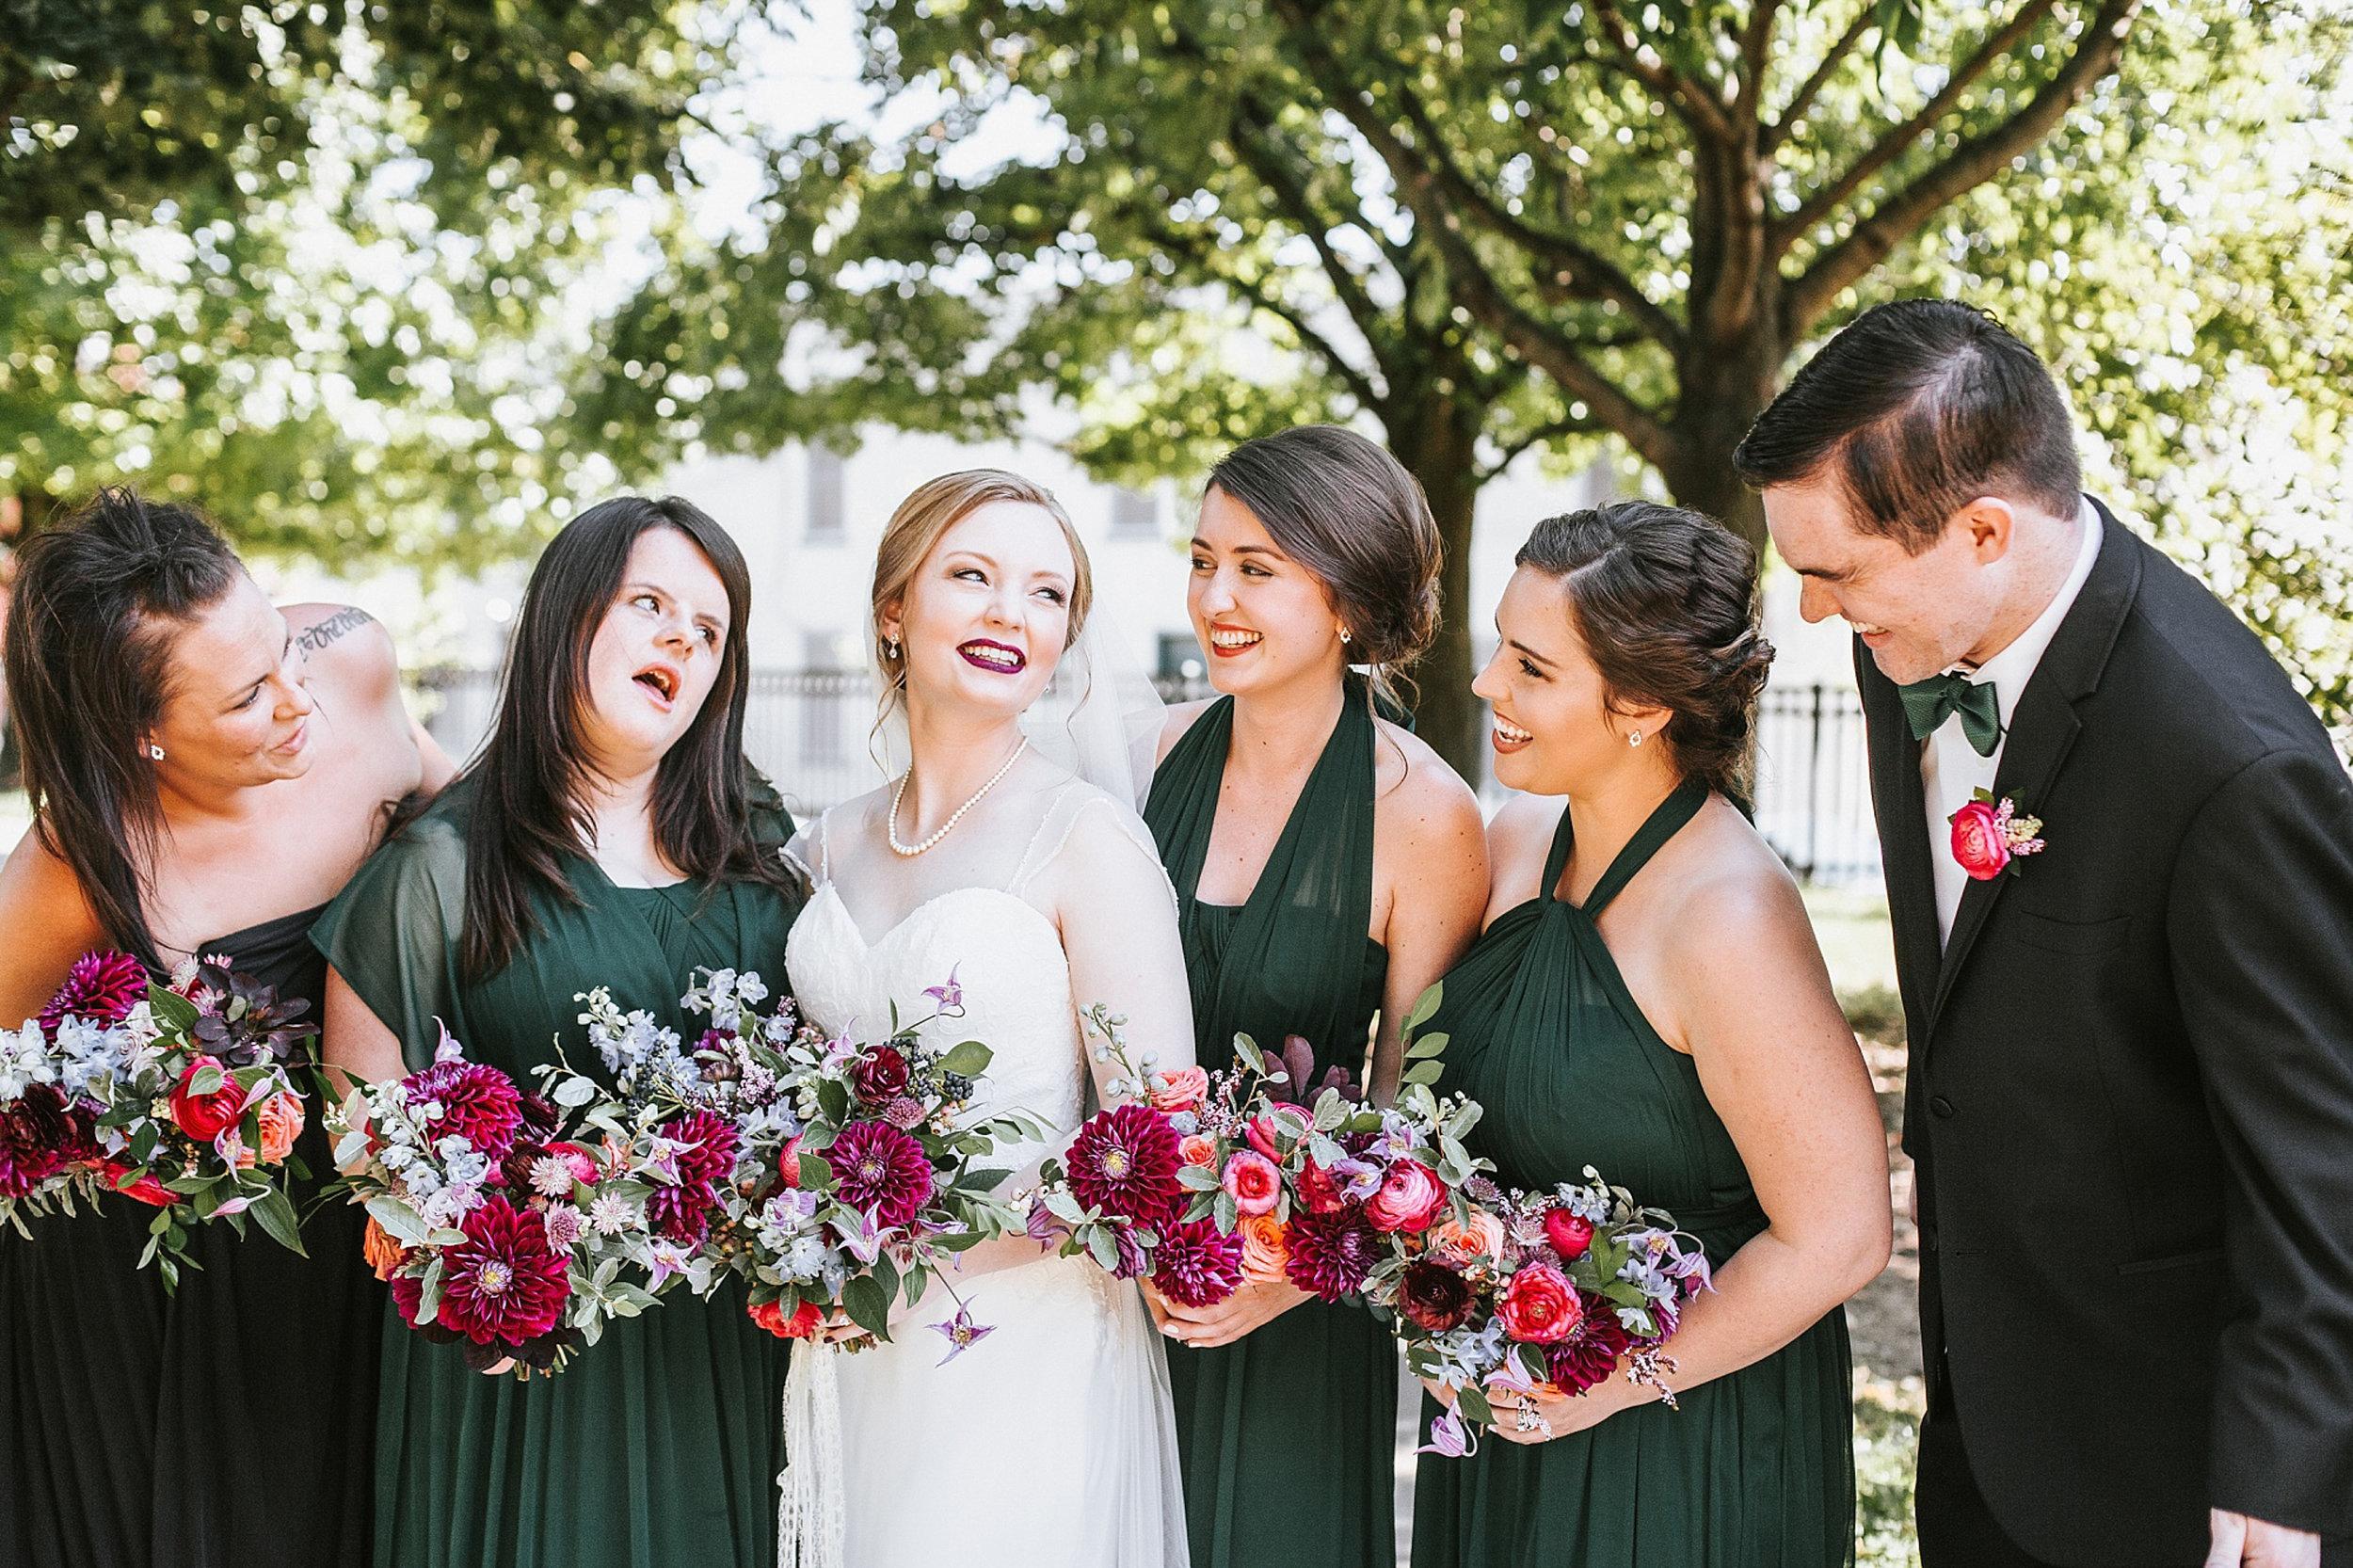 Brooke Townsend Photography - Ohio Wedding Photographer-81.jpg